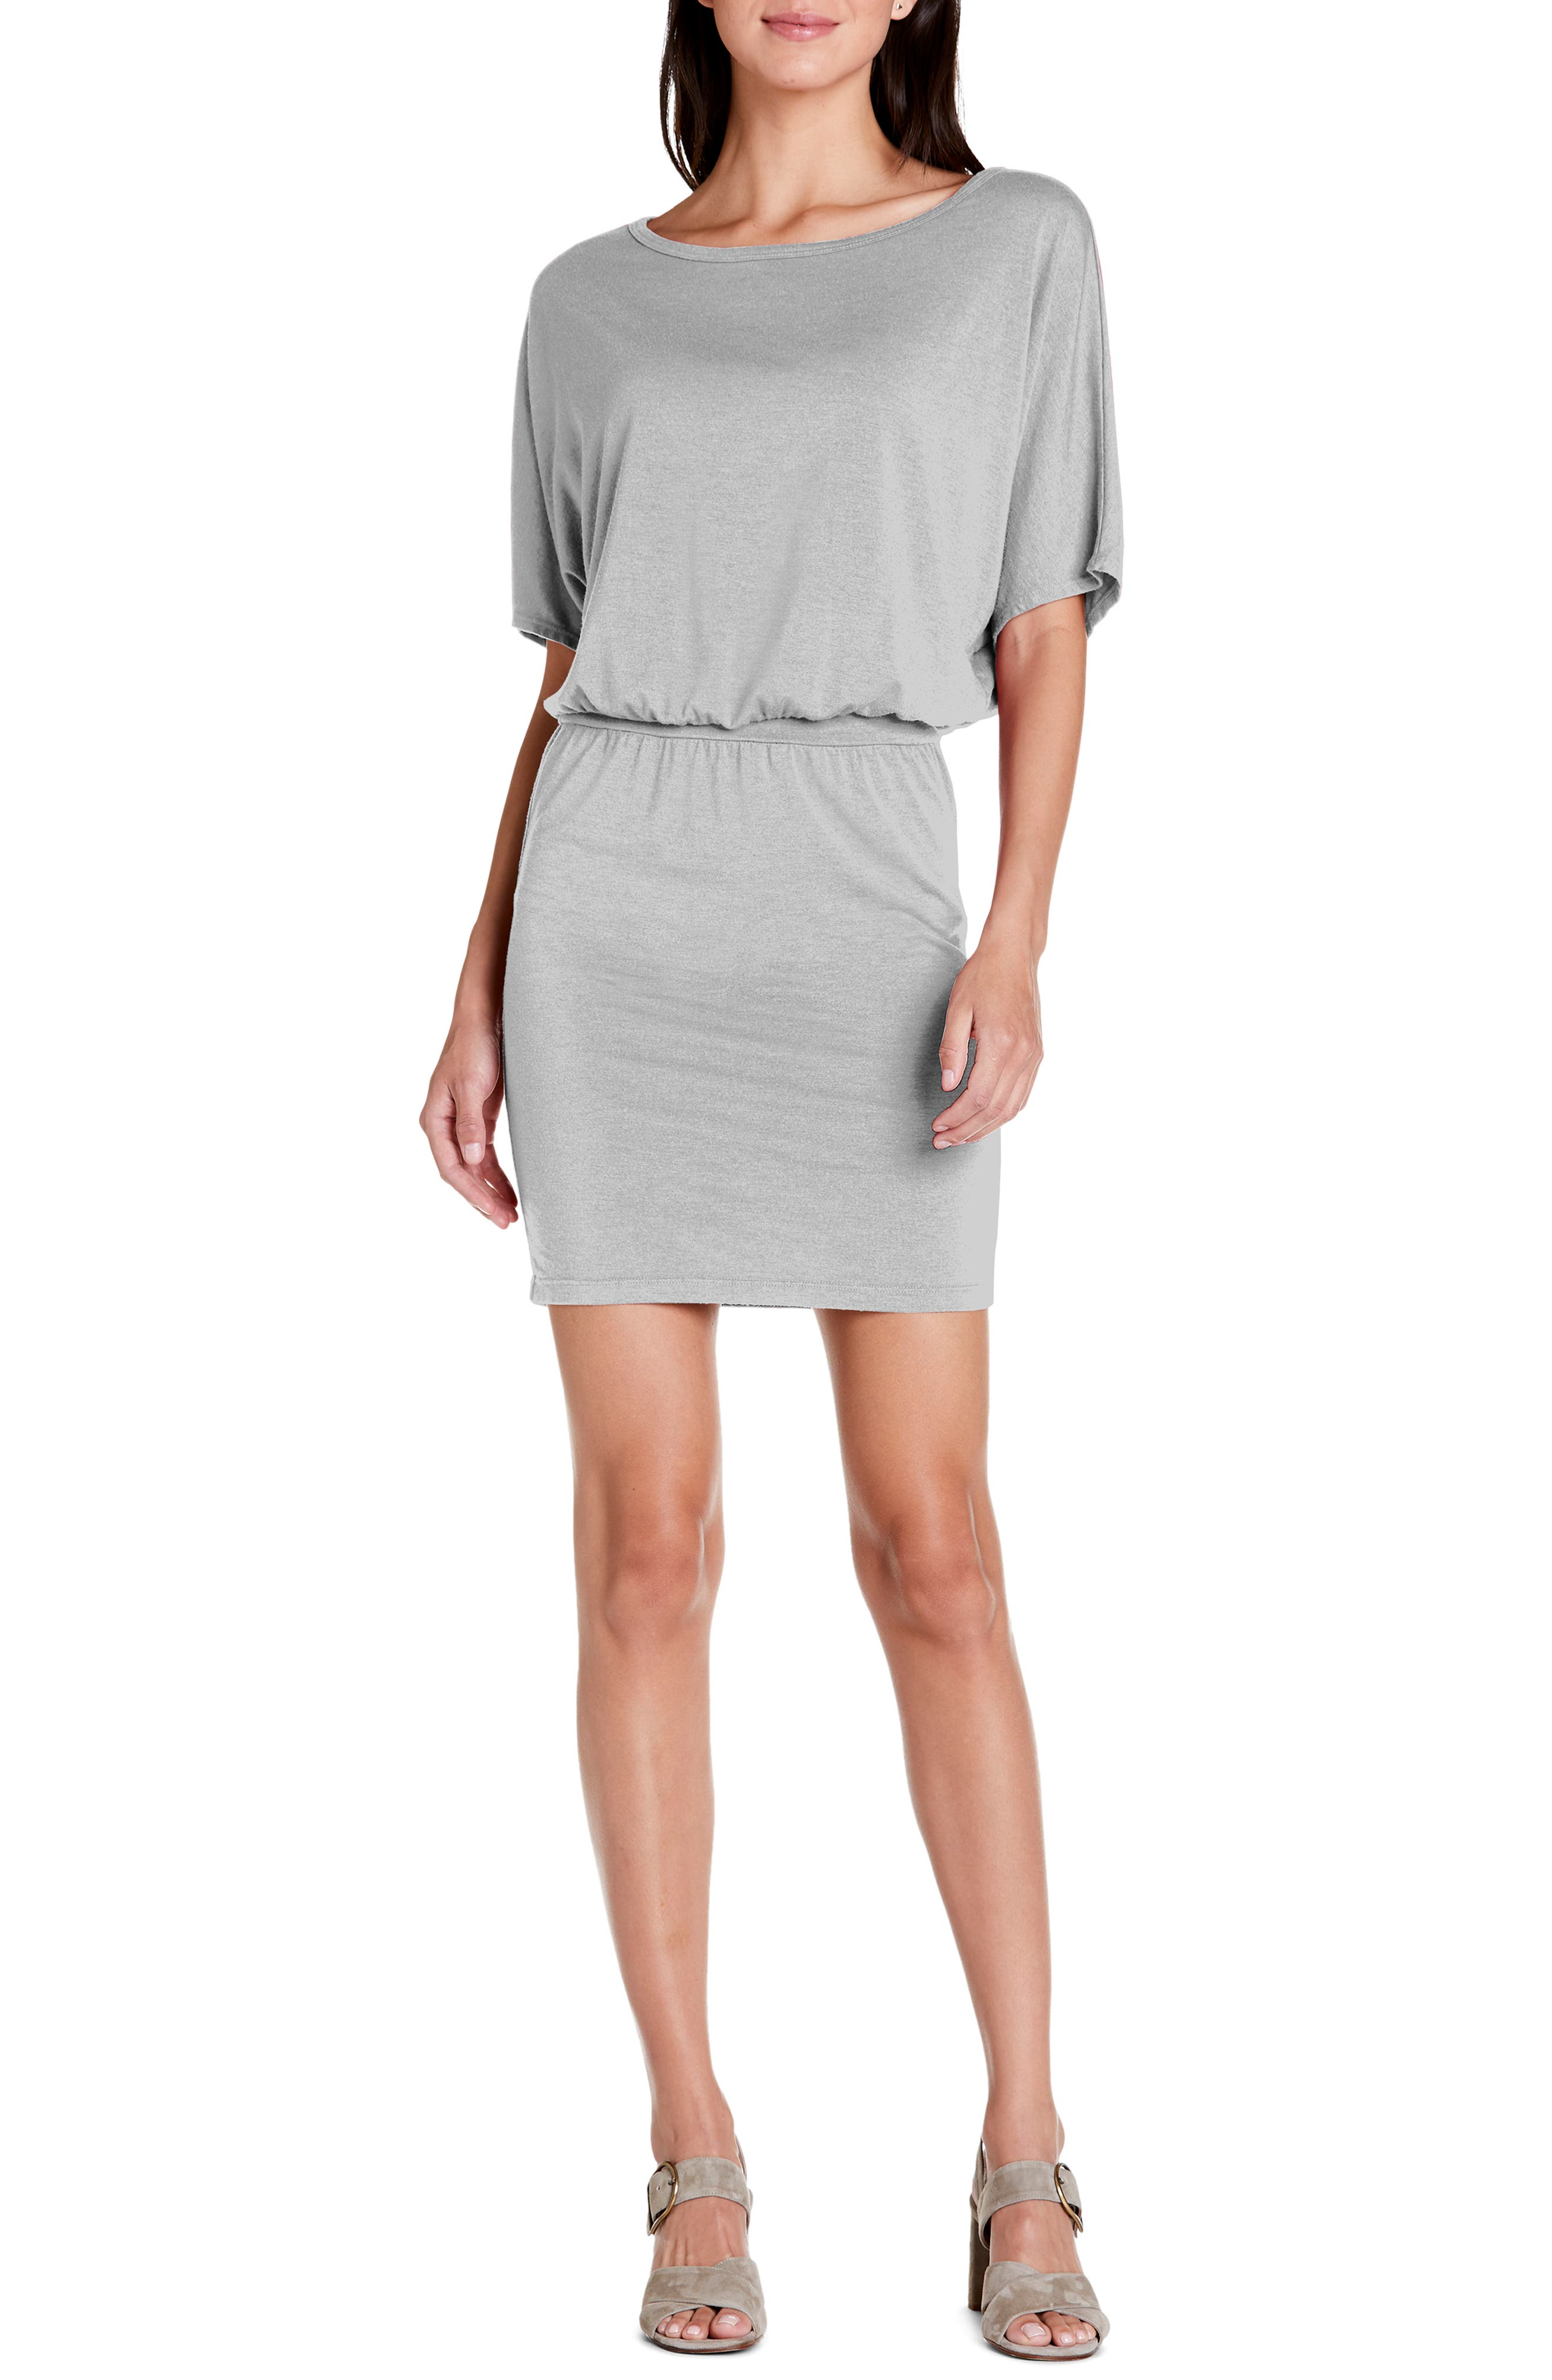 Michael Stars Erynn Elbow Sleeve Knit Dress, Grey